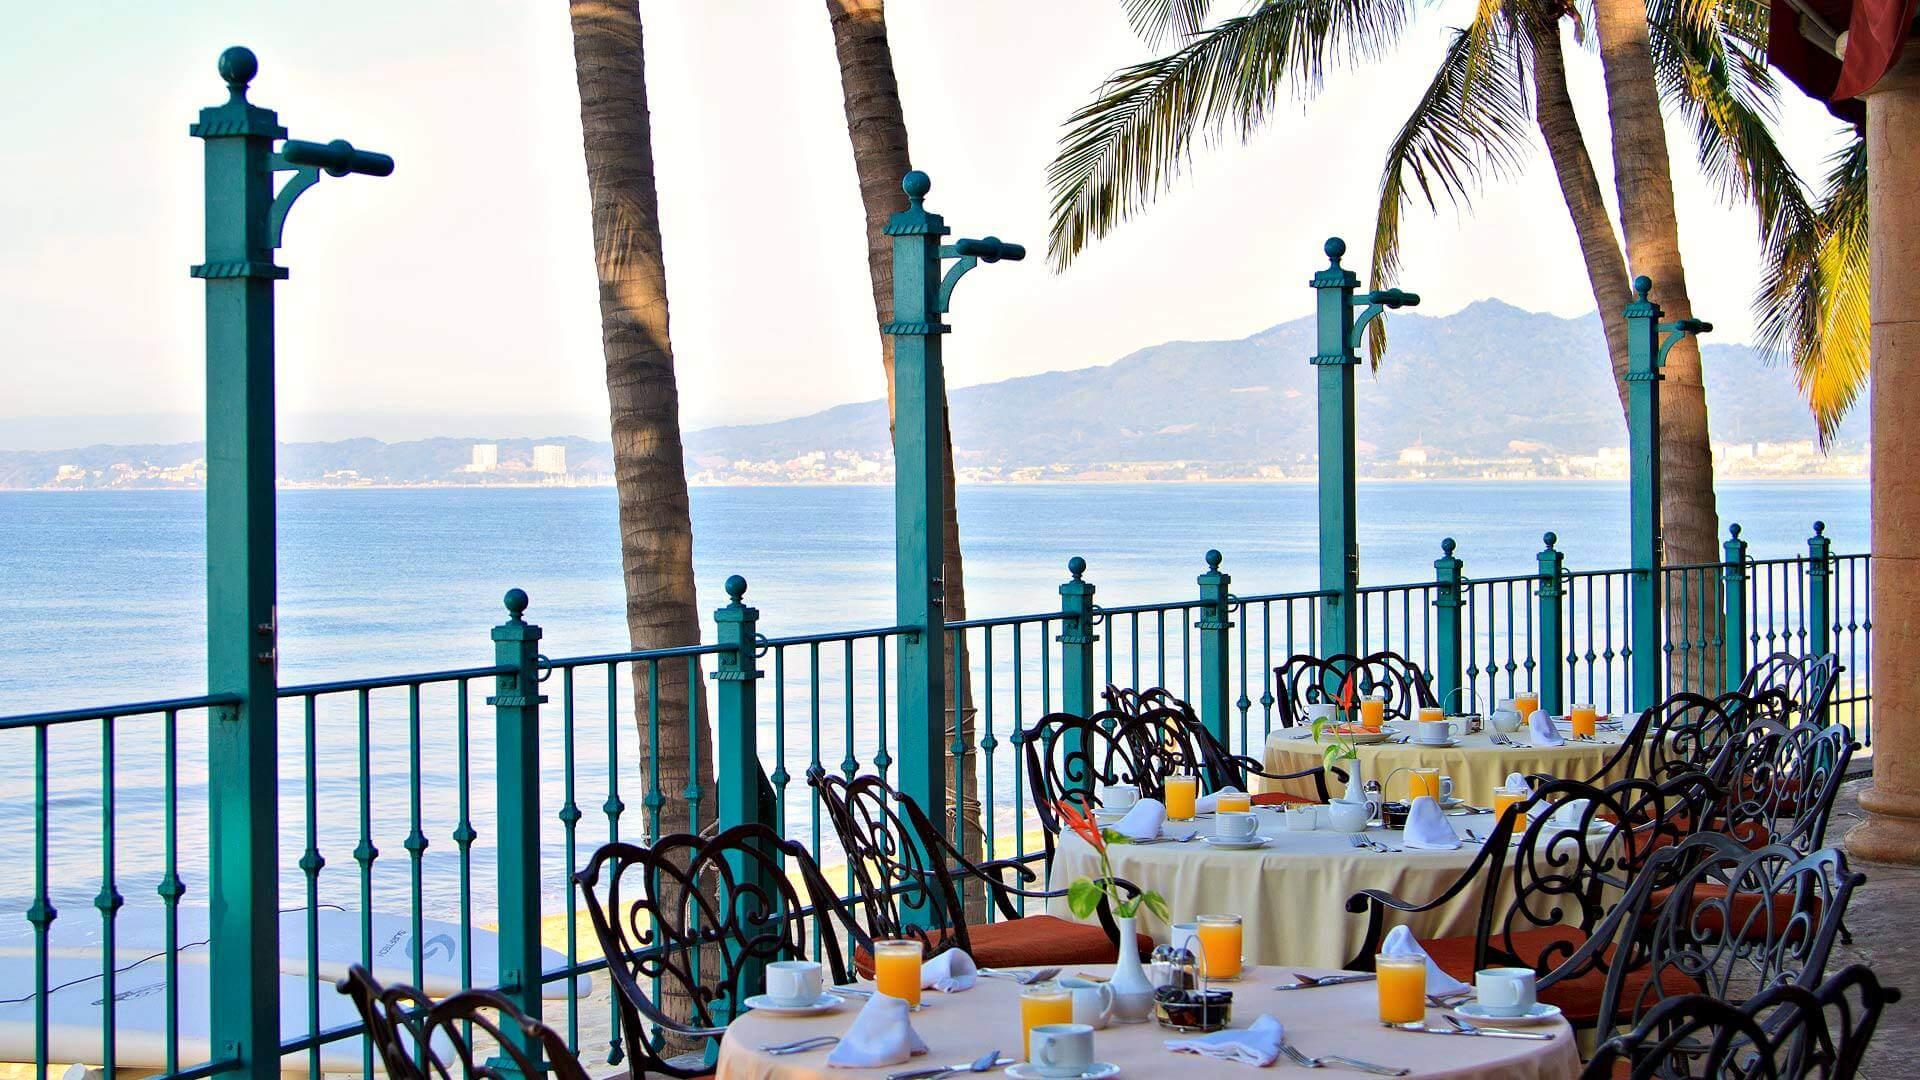 Riviera Nayarit Timeshare at Villa del Palmar and its Cuisine